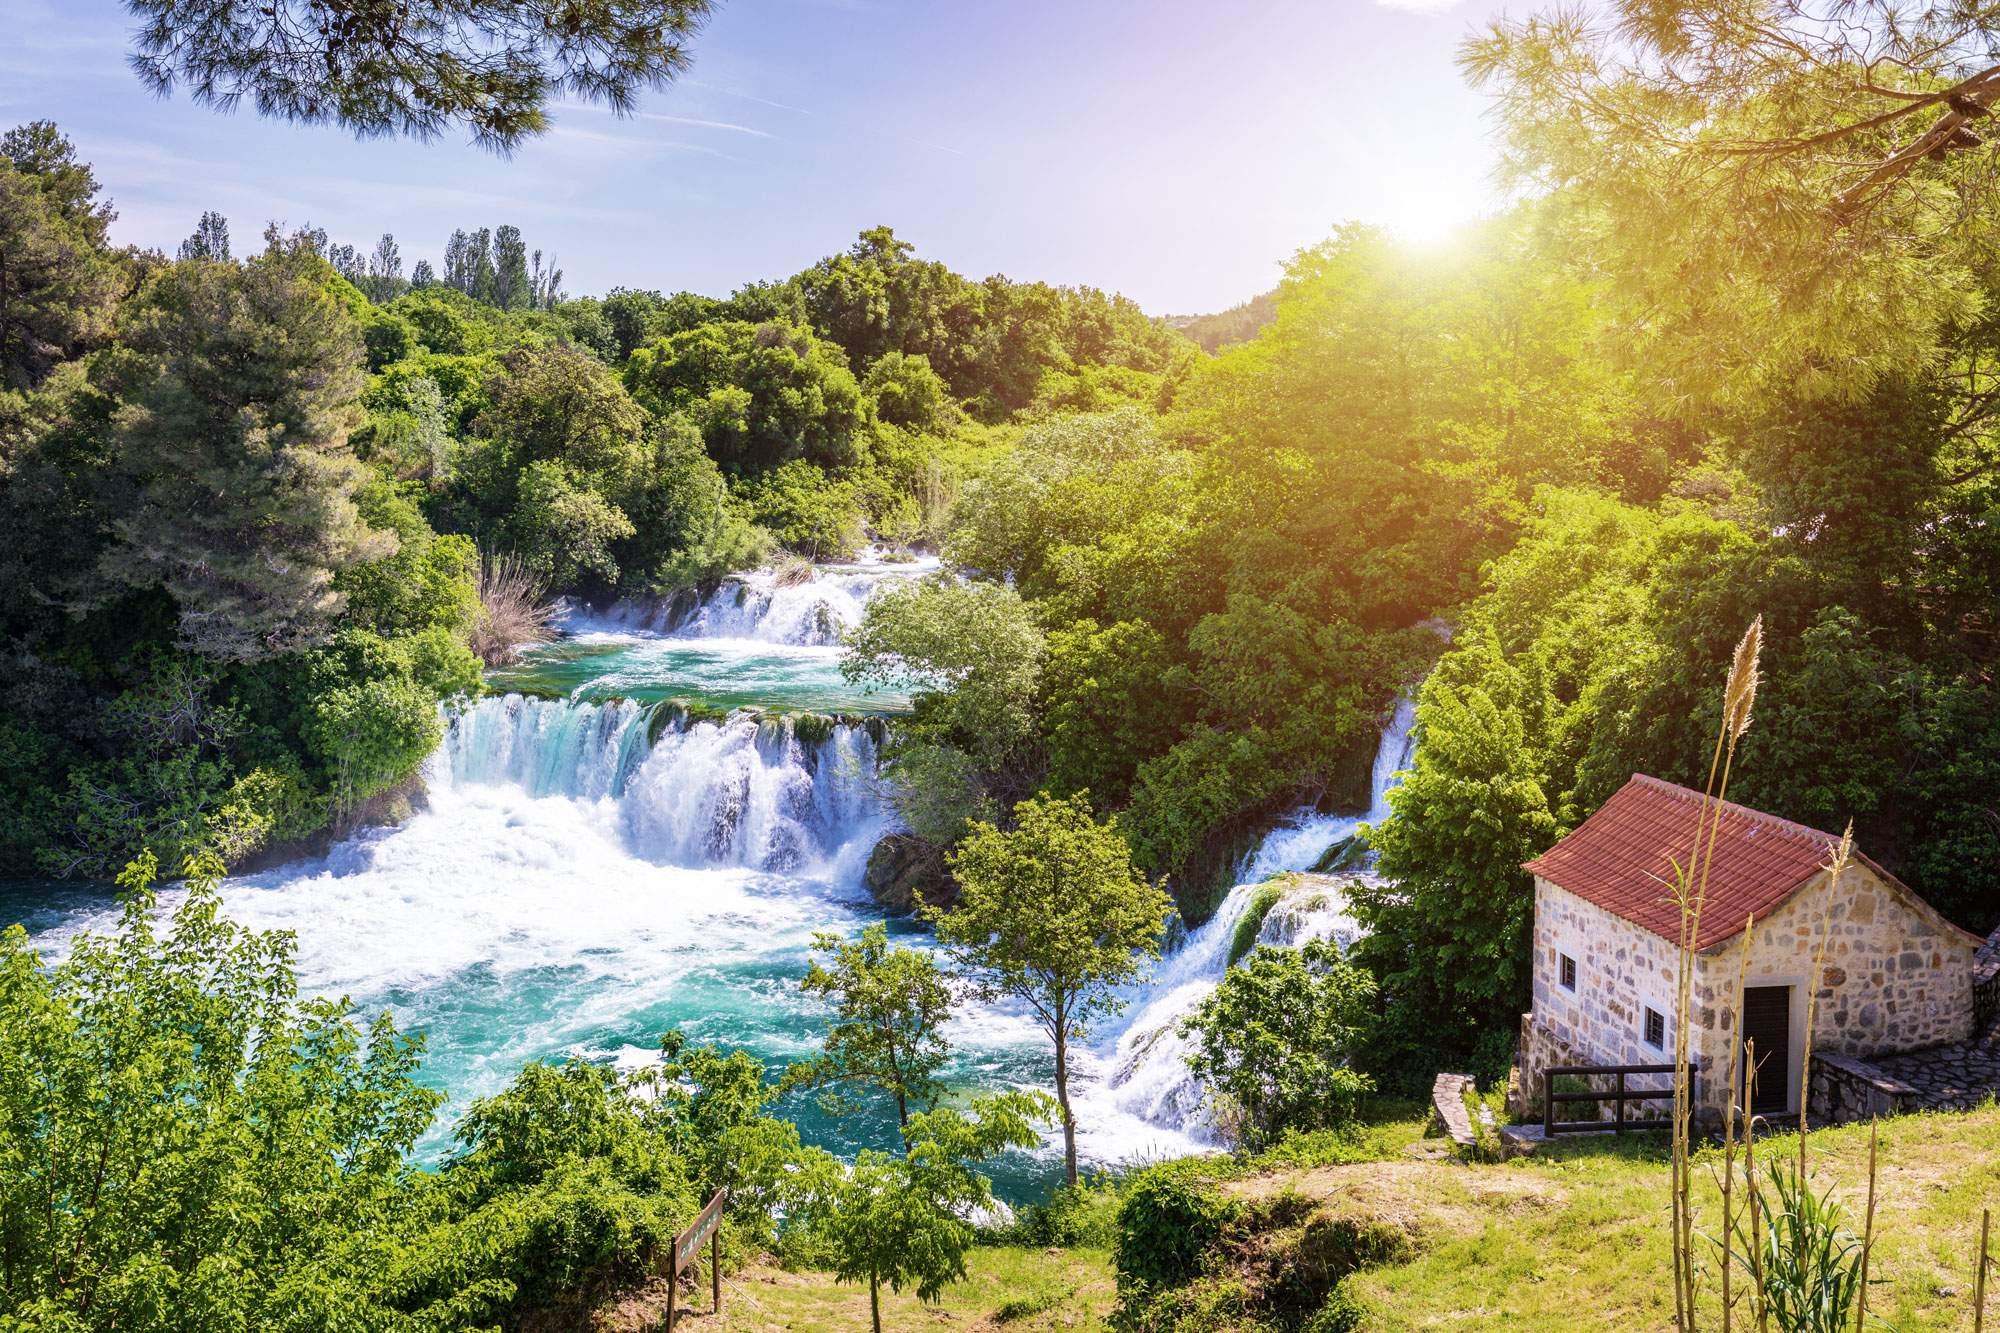 krka-national-park-croatia-travel-destination